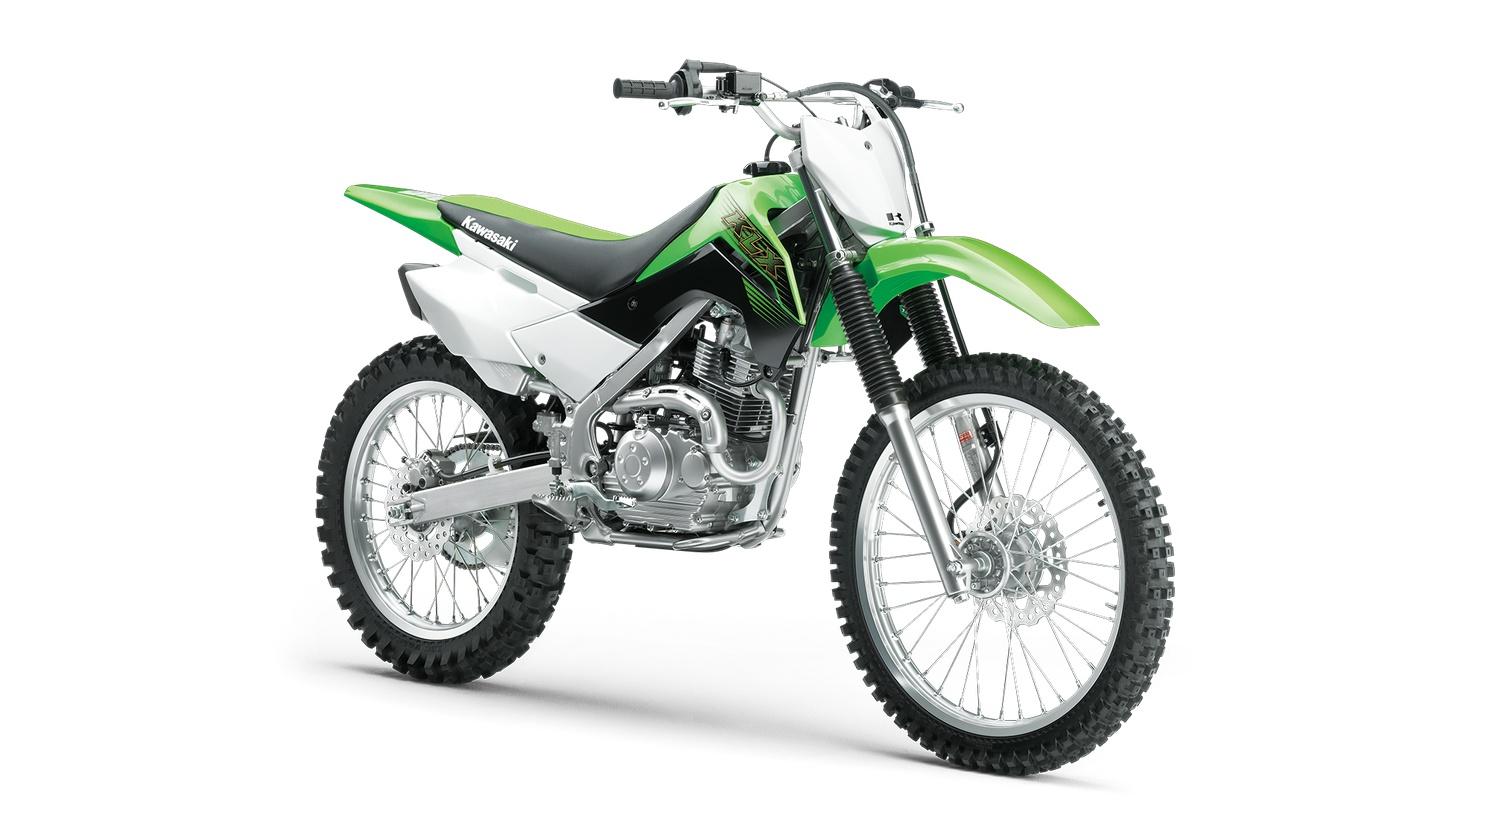 2020 Kawasaki KLX140G Lime Green